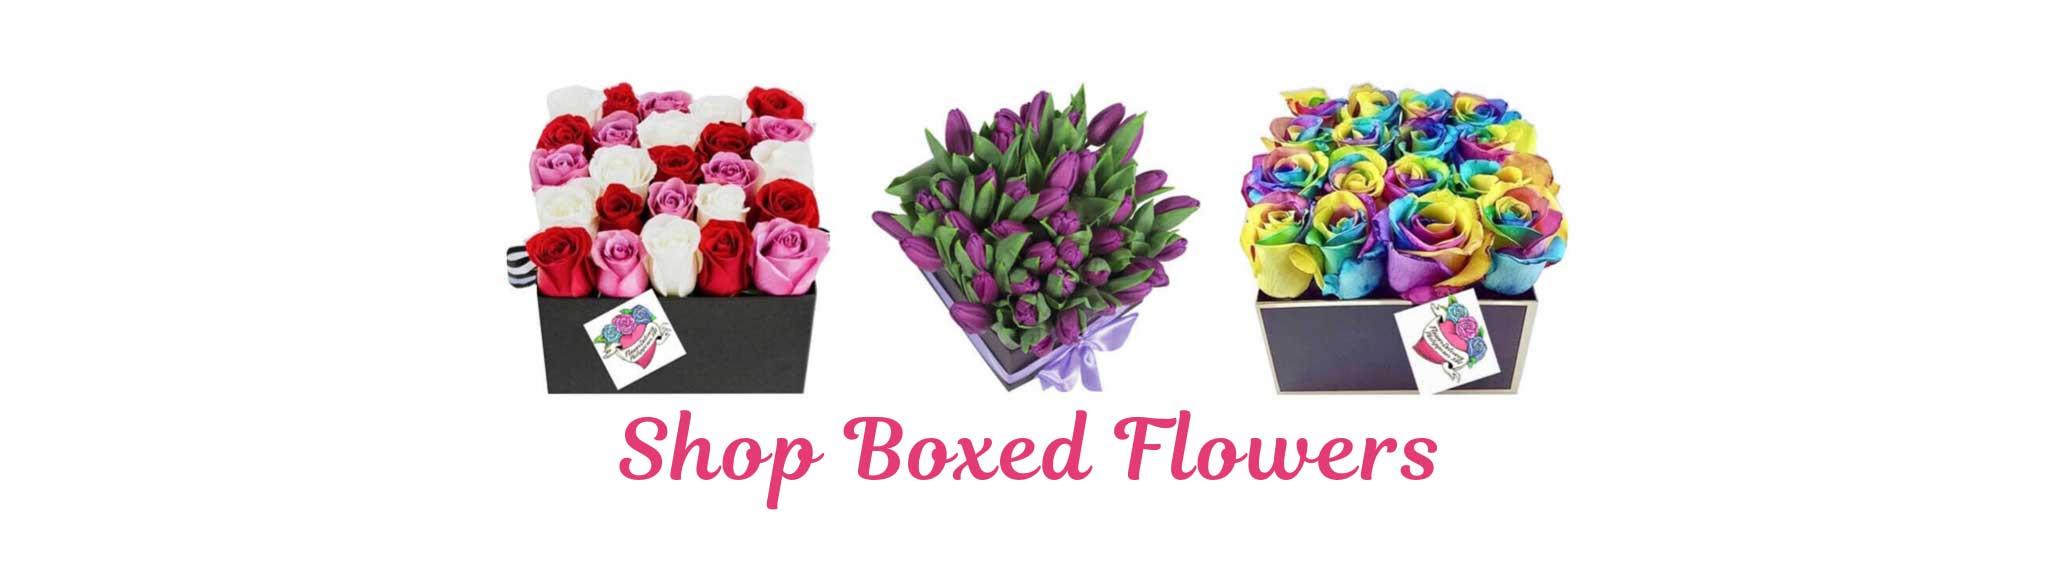 boxed-flowers-final-banner.jpg